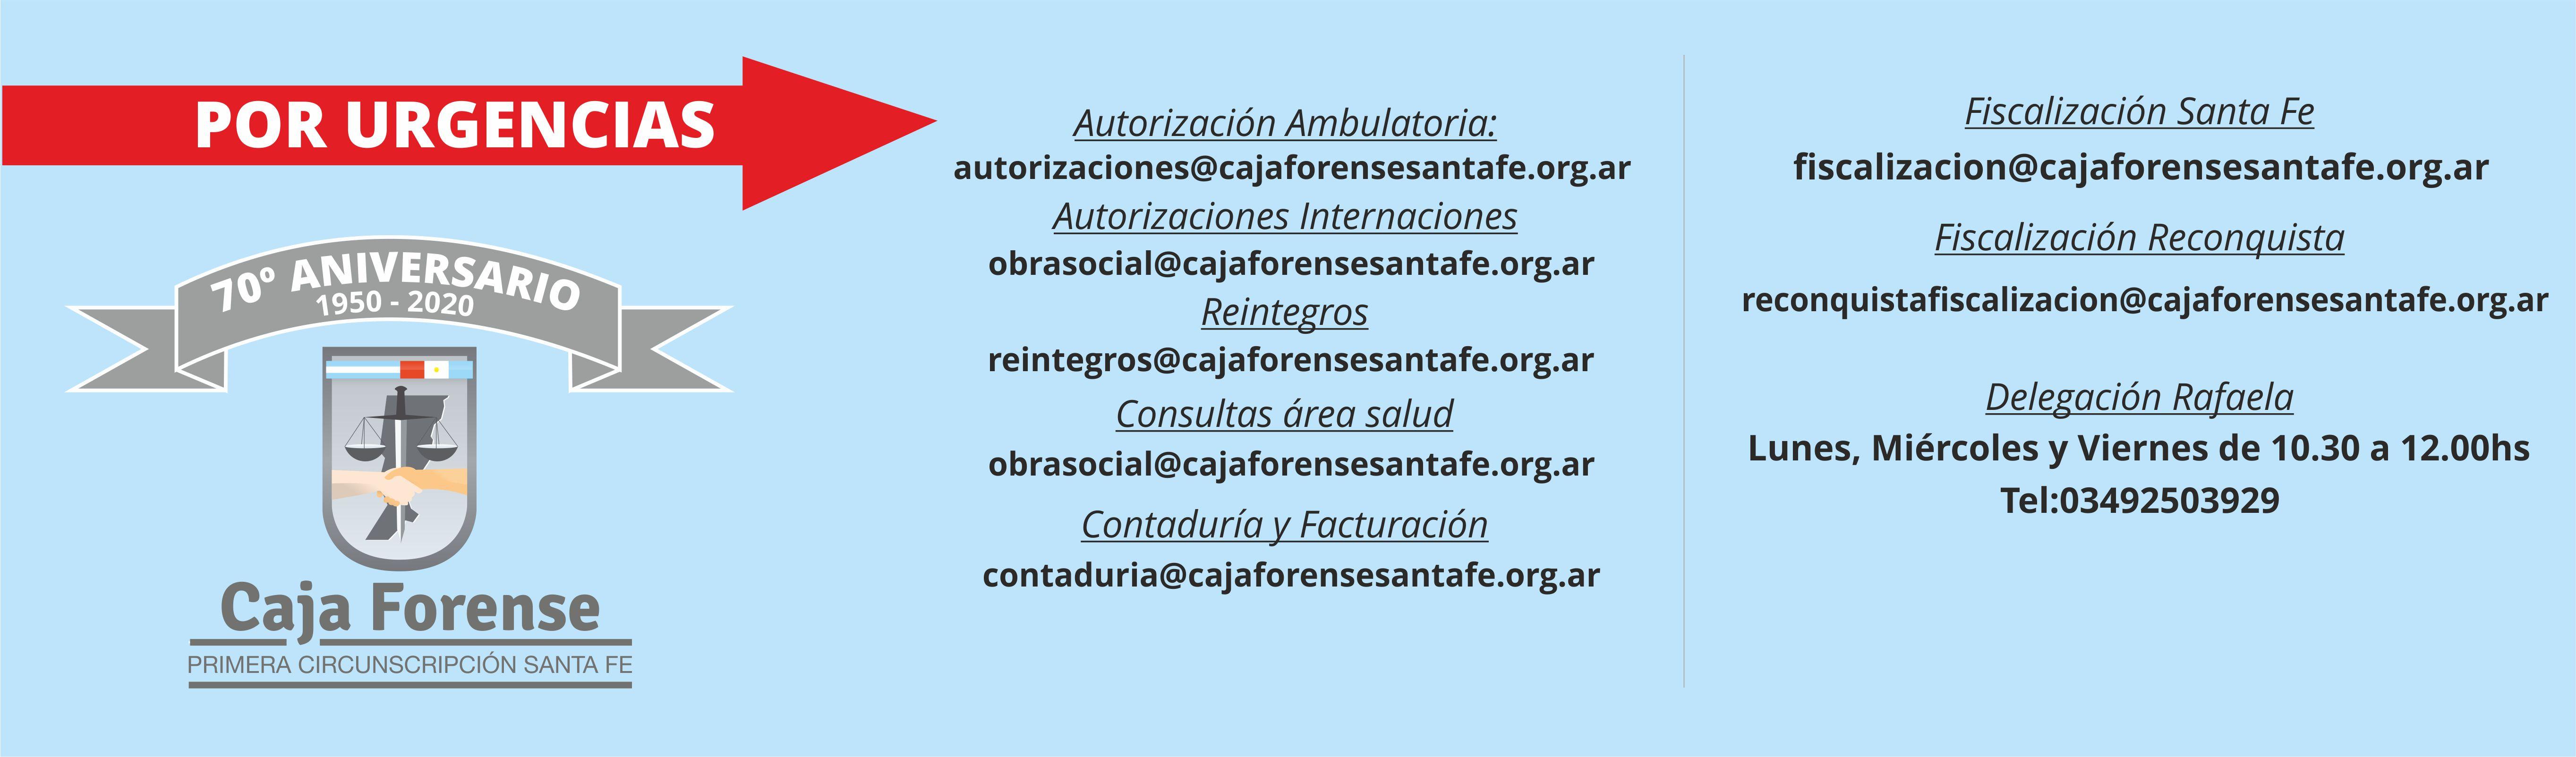 urgencias-4